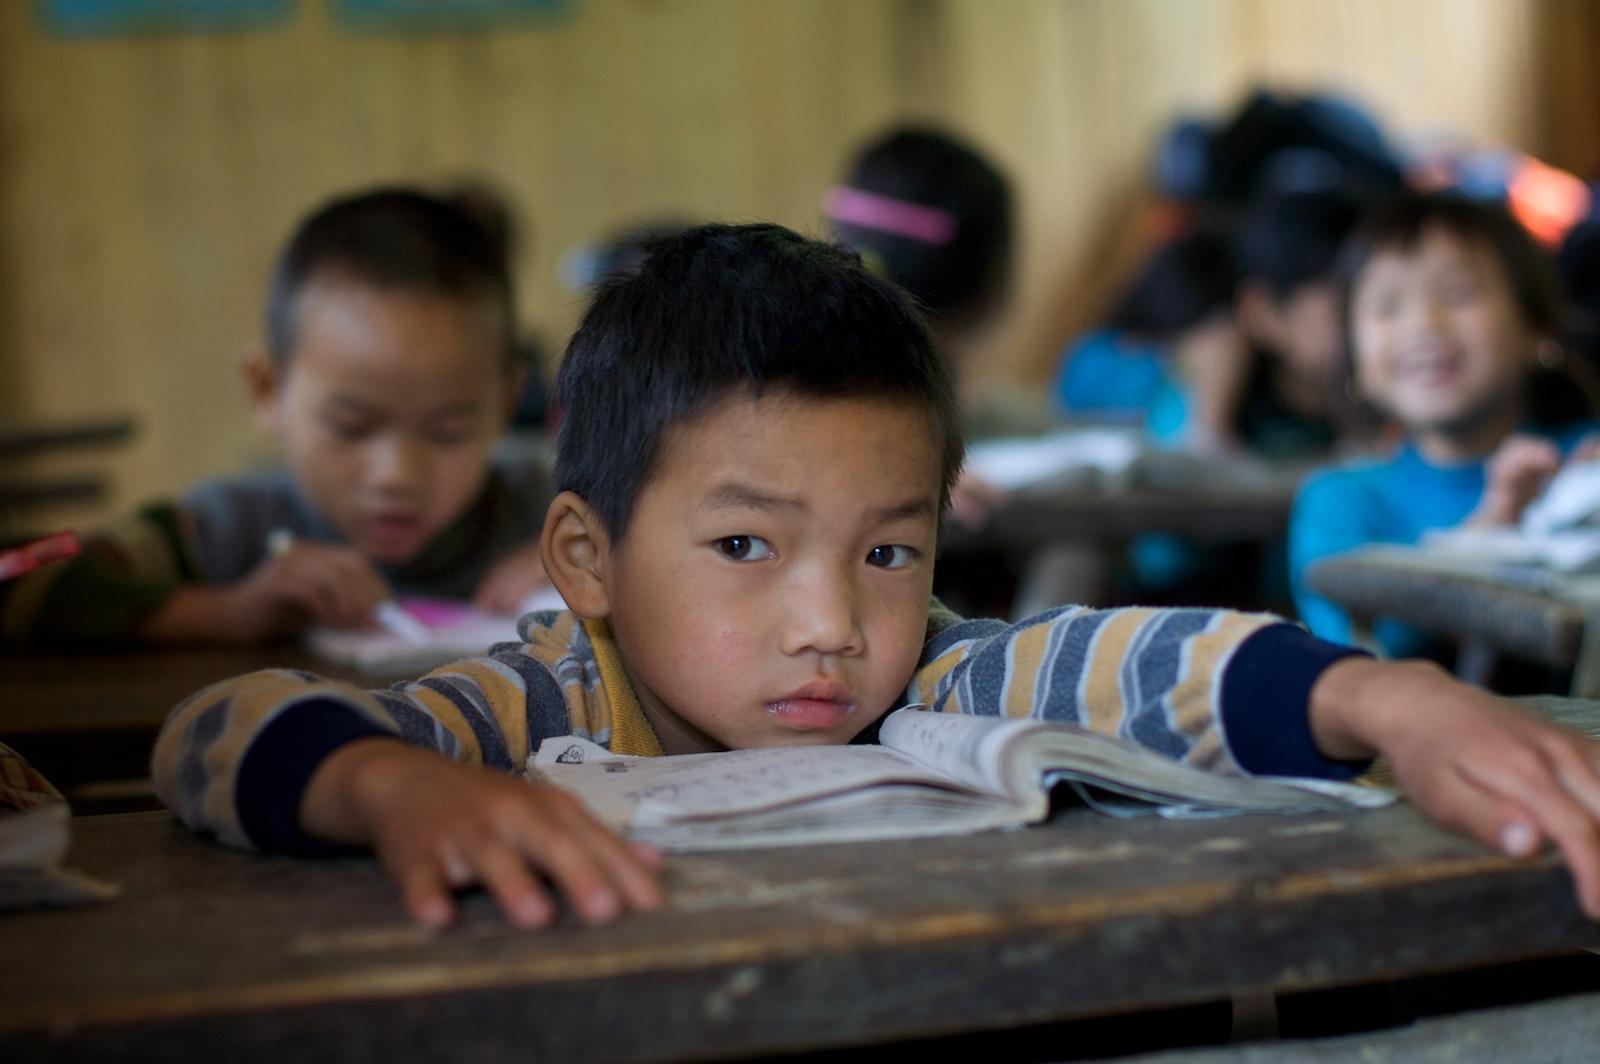 Zaimen Grundschule im Dorf Fengdeng, Provinz Guizhou; (c) Randomix, https://www.flickr.com/photos/randomix/2589947842/